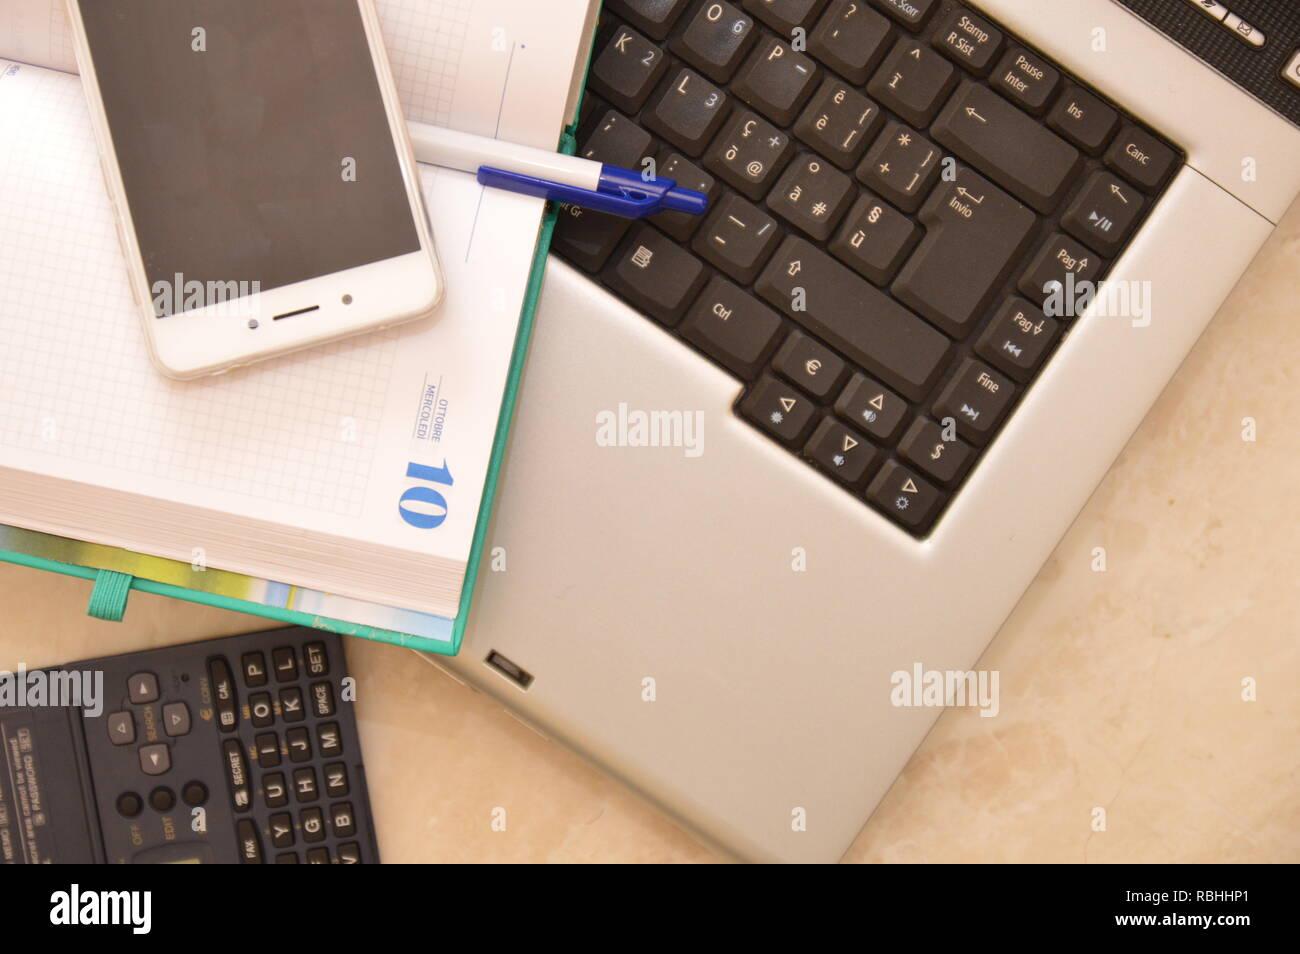 notebbok telephon pen work business calcilator - Stock Image